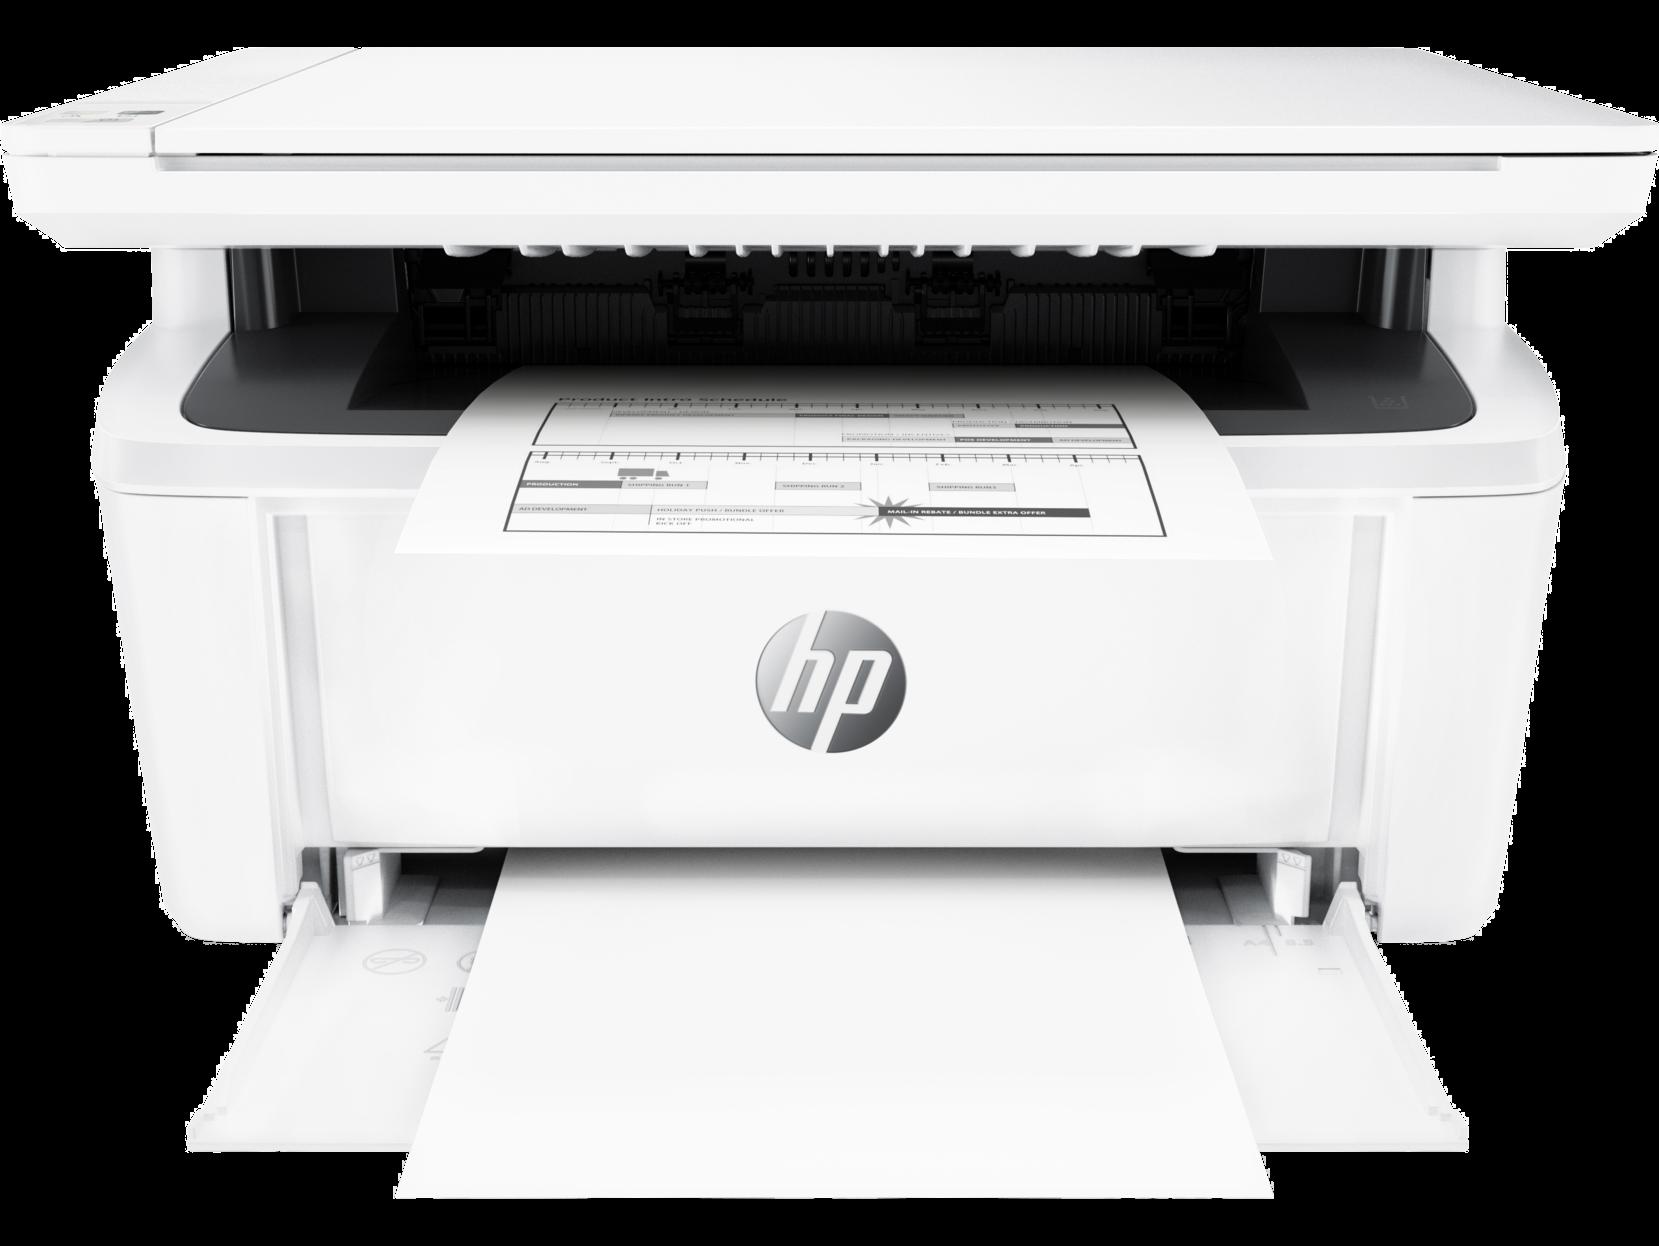 Máy in đa chức năng HP LaserJet Pro M28a (In, Scan, Copy)